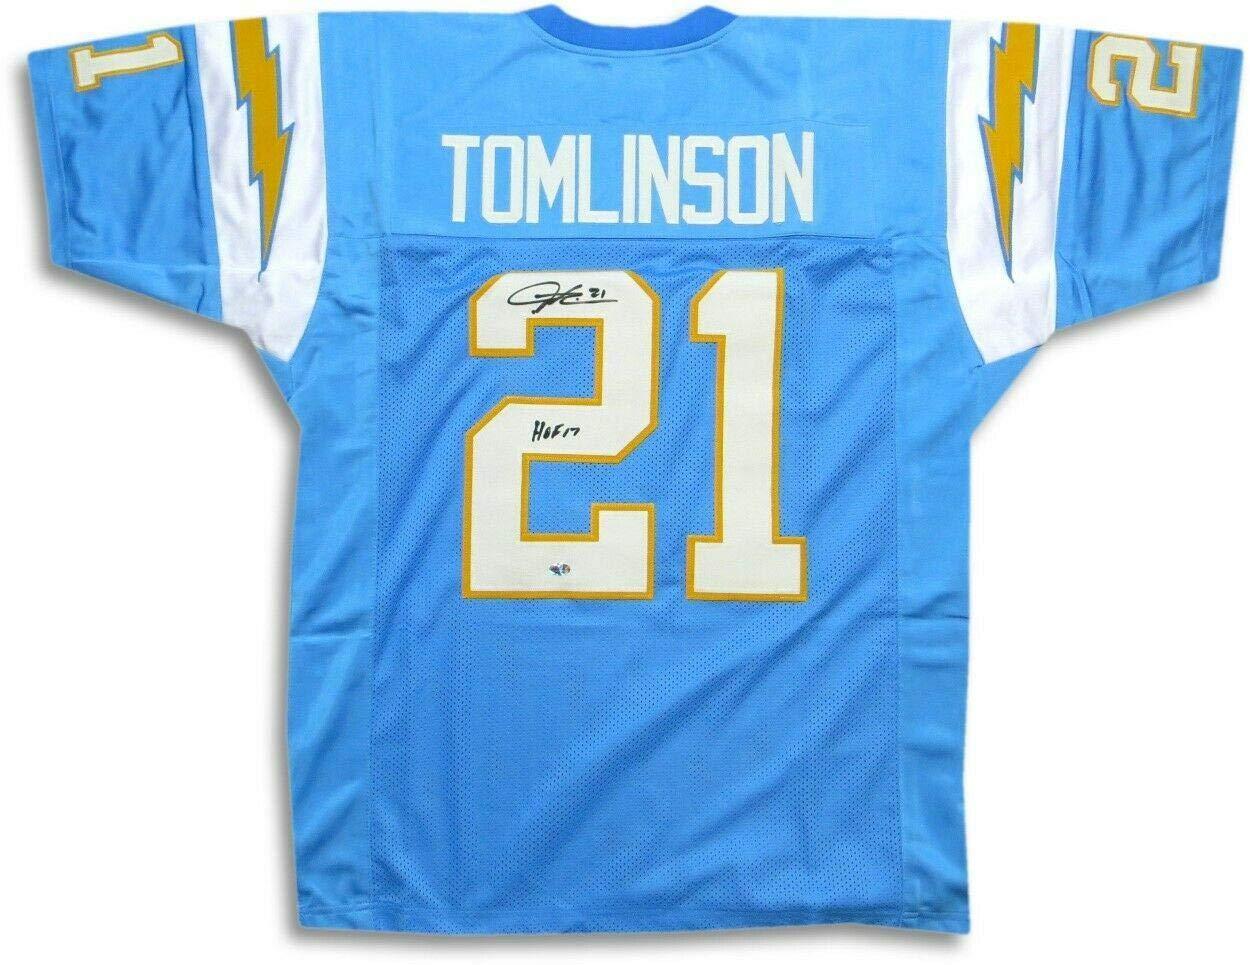 Signed LaDainian Tomlinson Jersey